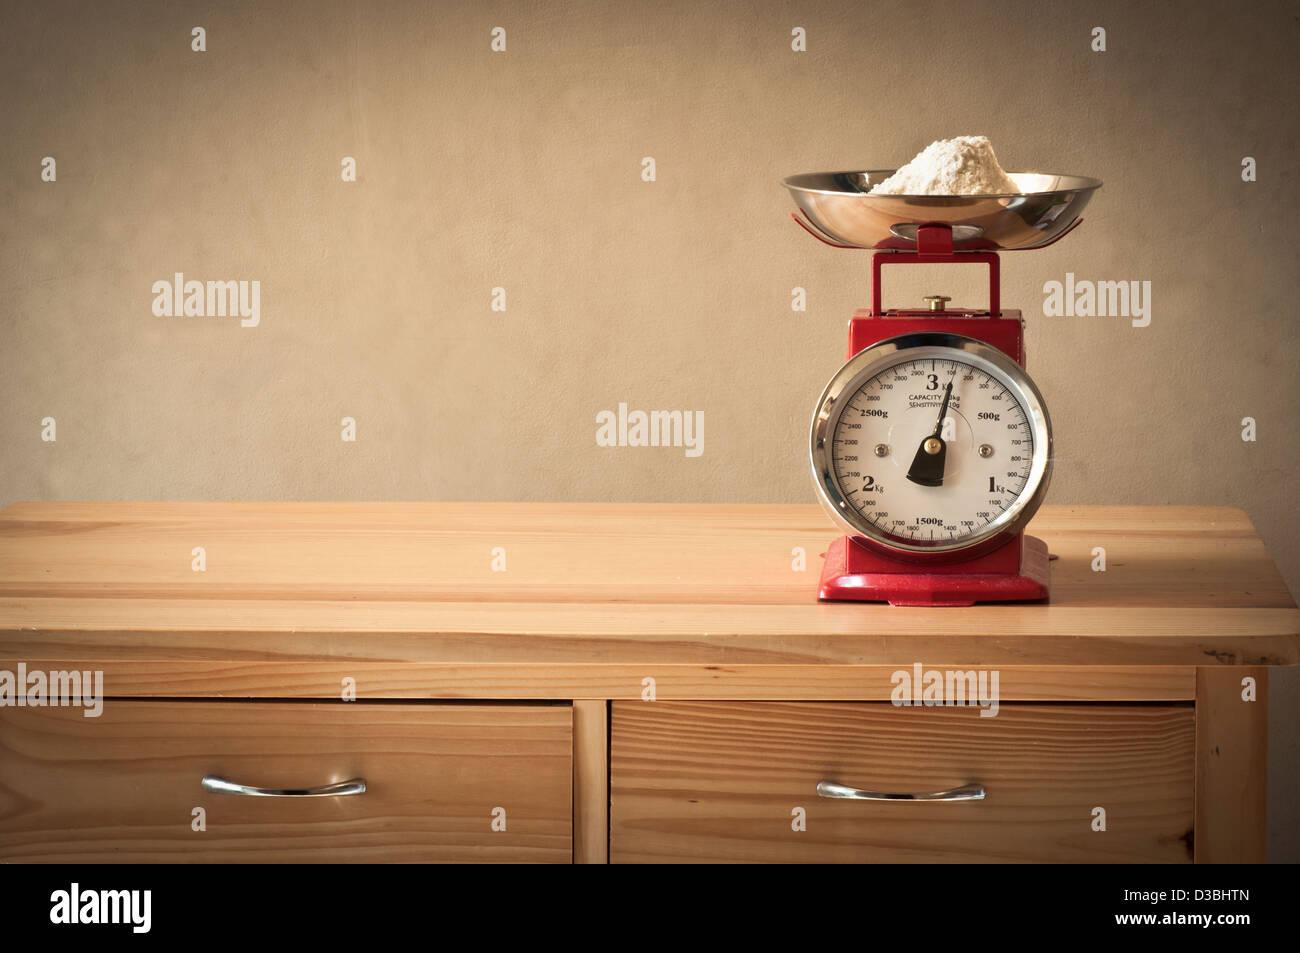 Retro kitchen scales - Stock Image